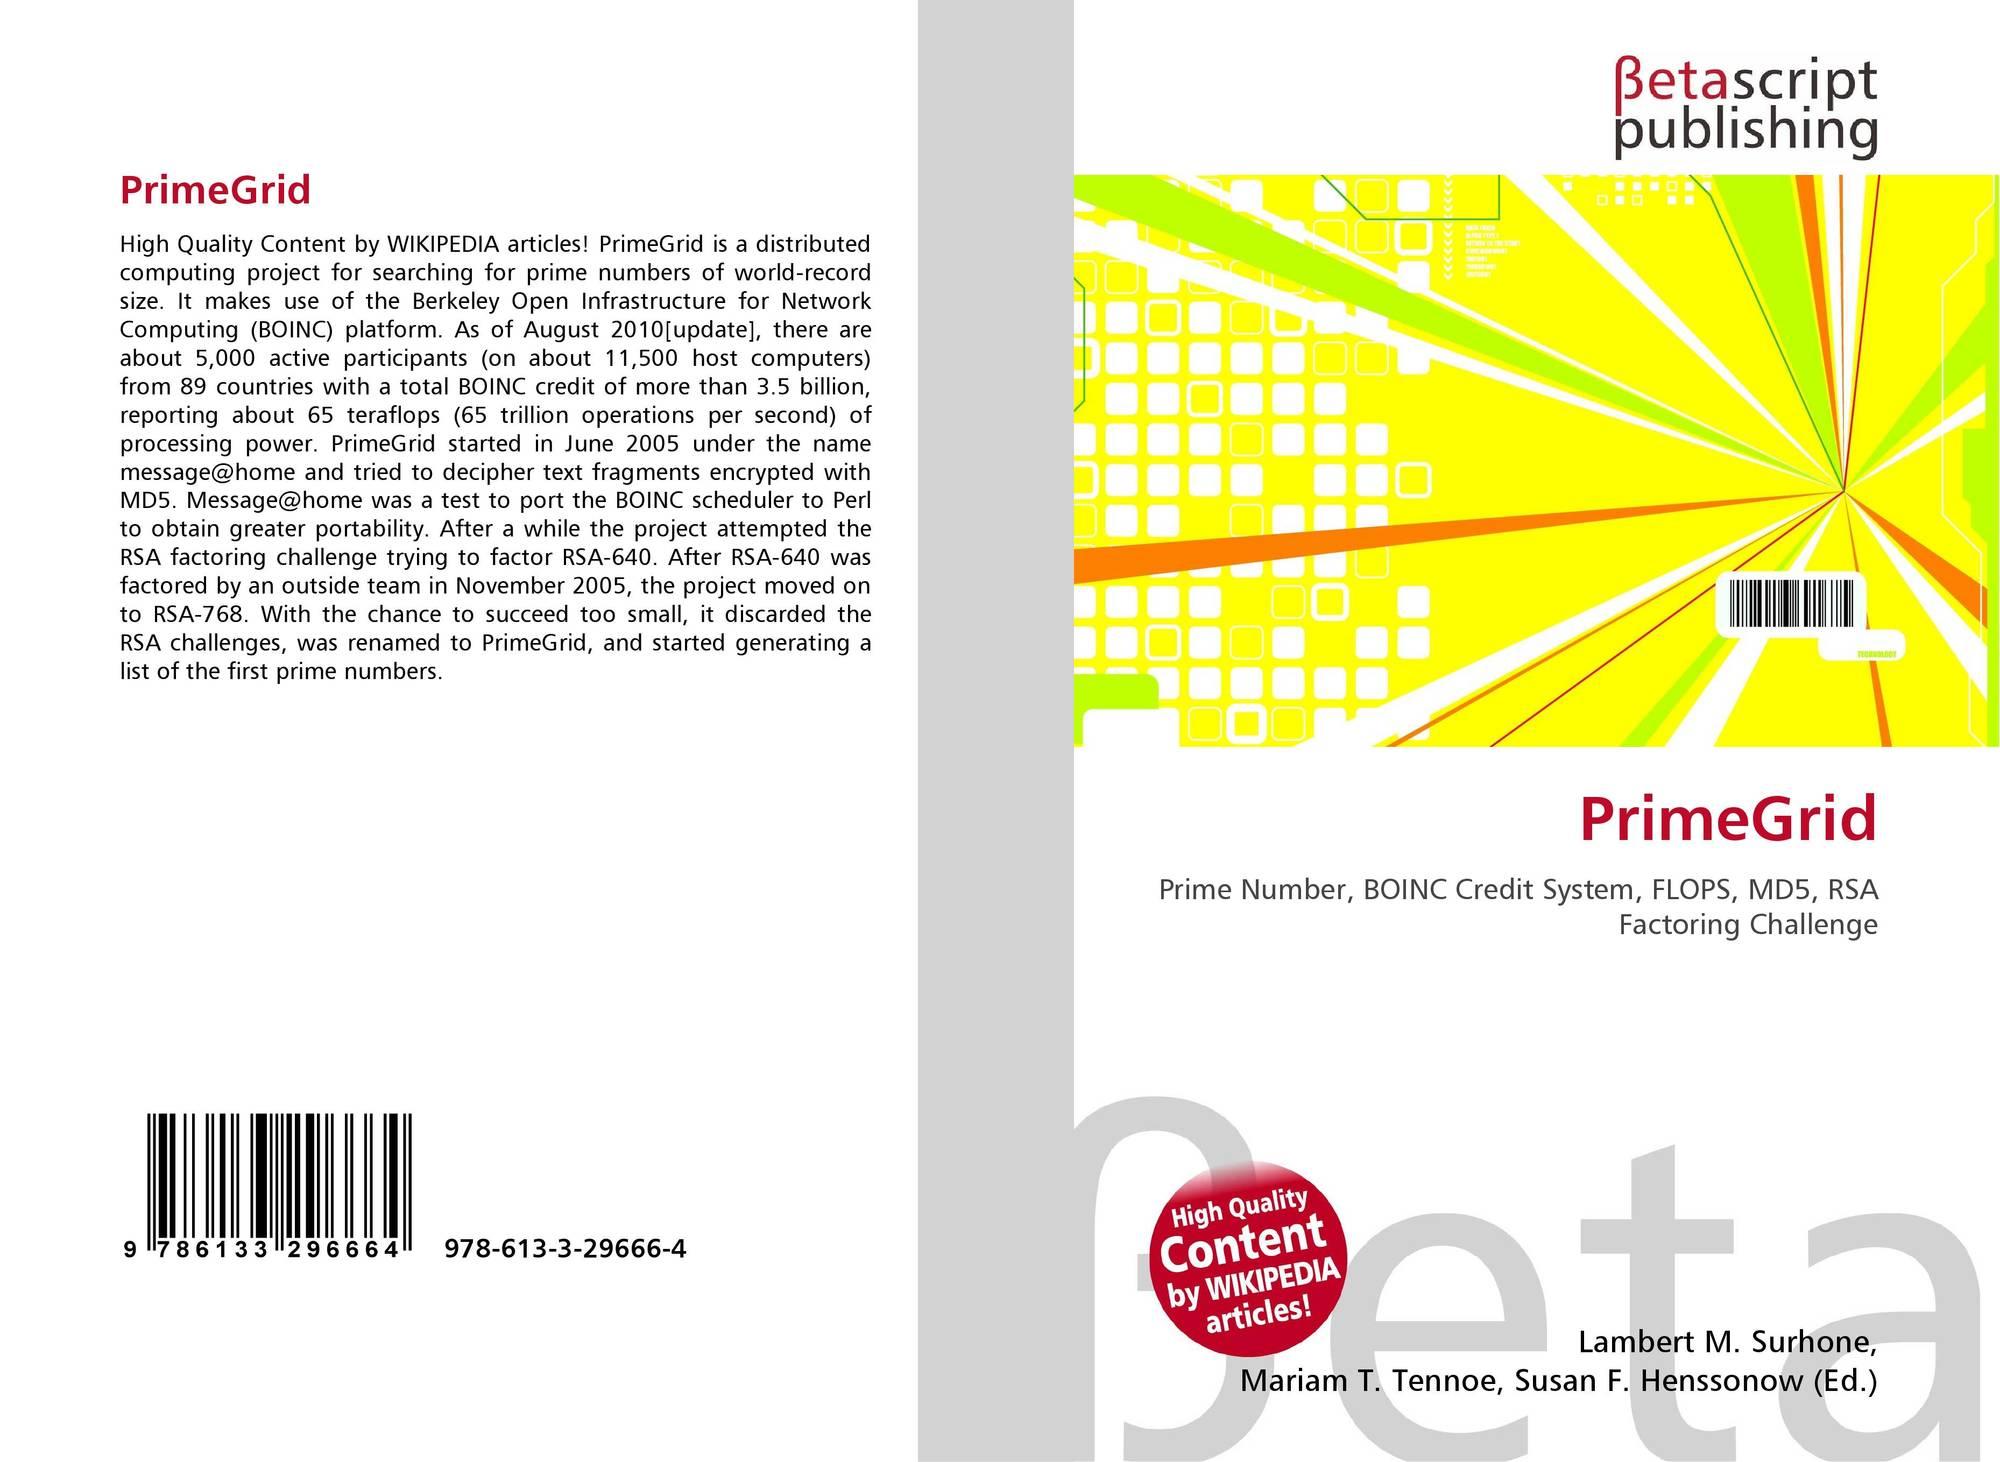 PrimeGrid, 978-613-3-29666-4, ...